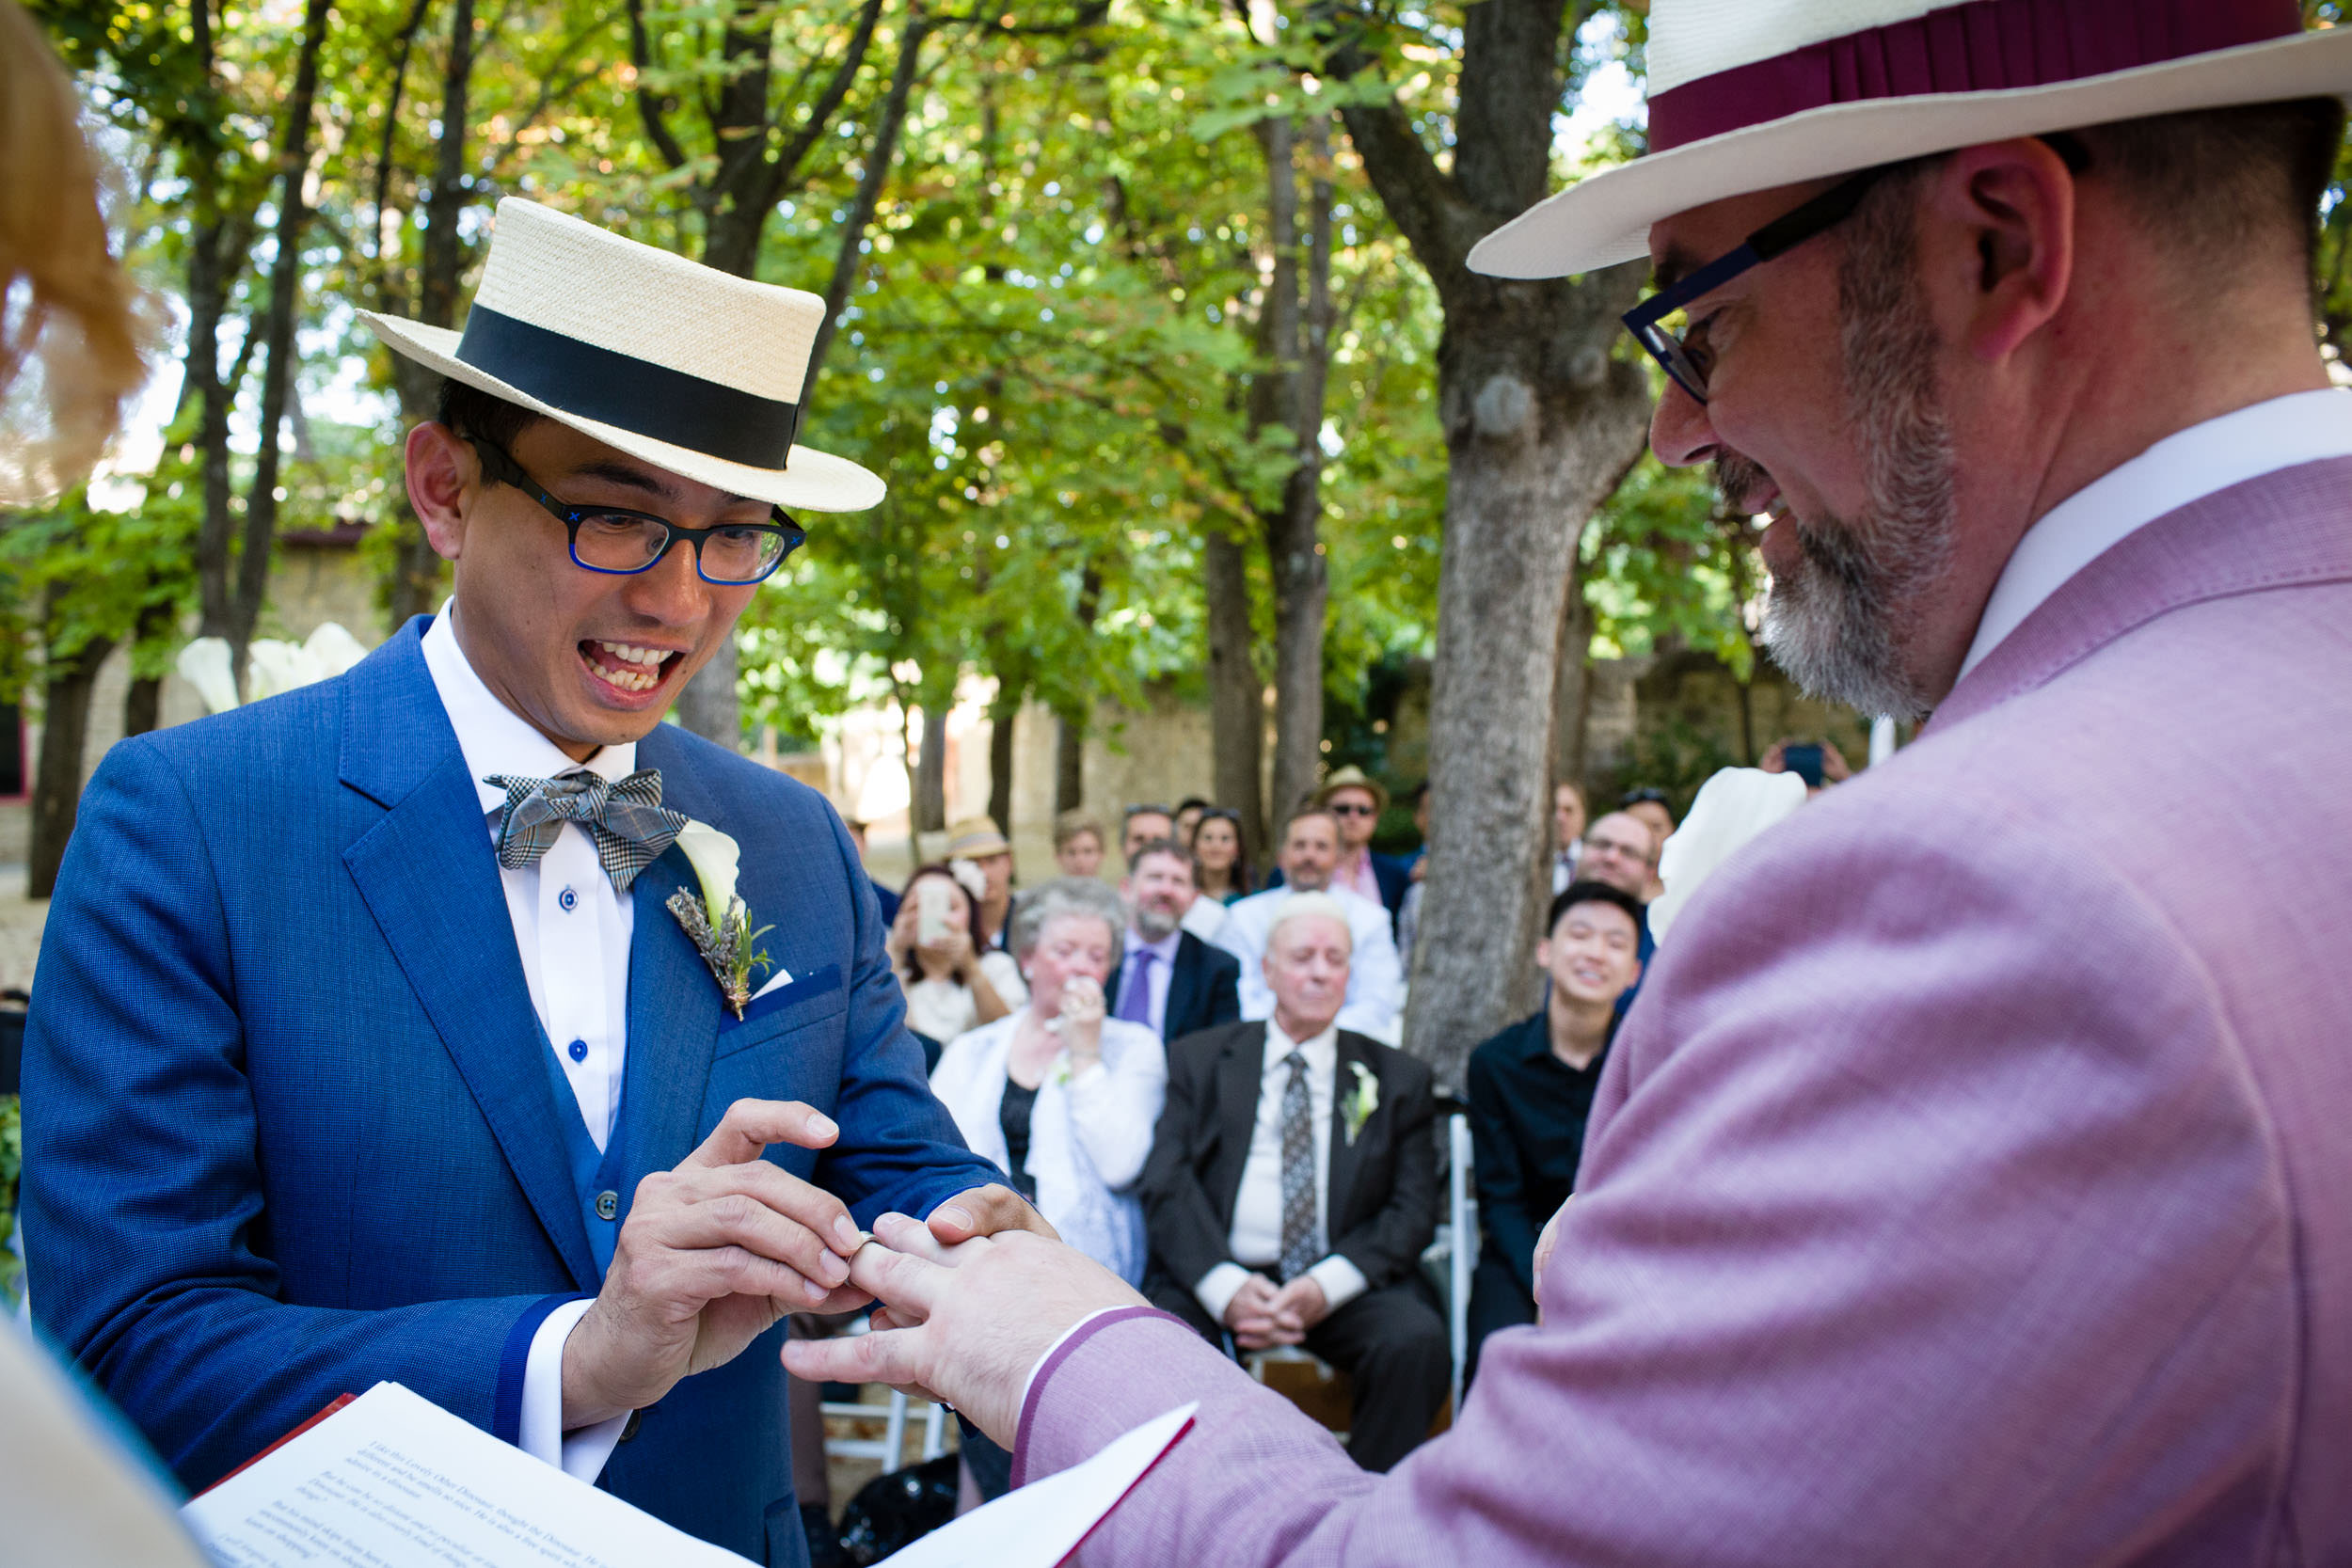 Wedding Photographer La Rioja Basque Country Spain - James Sturcke - sturcke.org_038.jpg